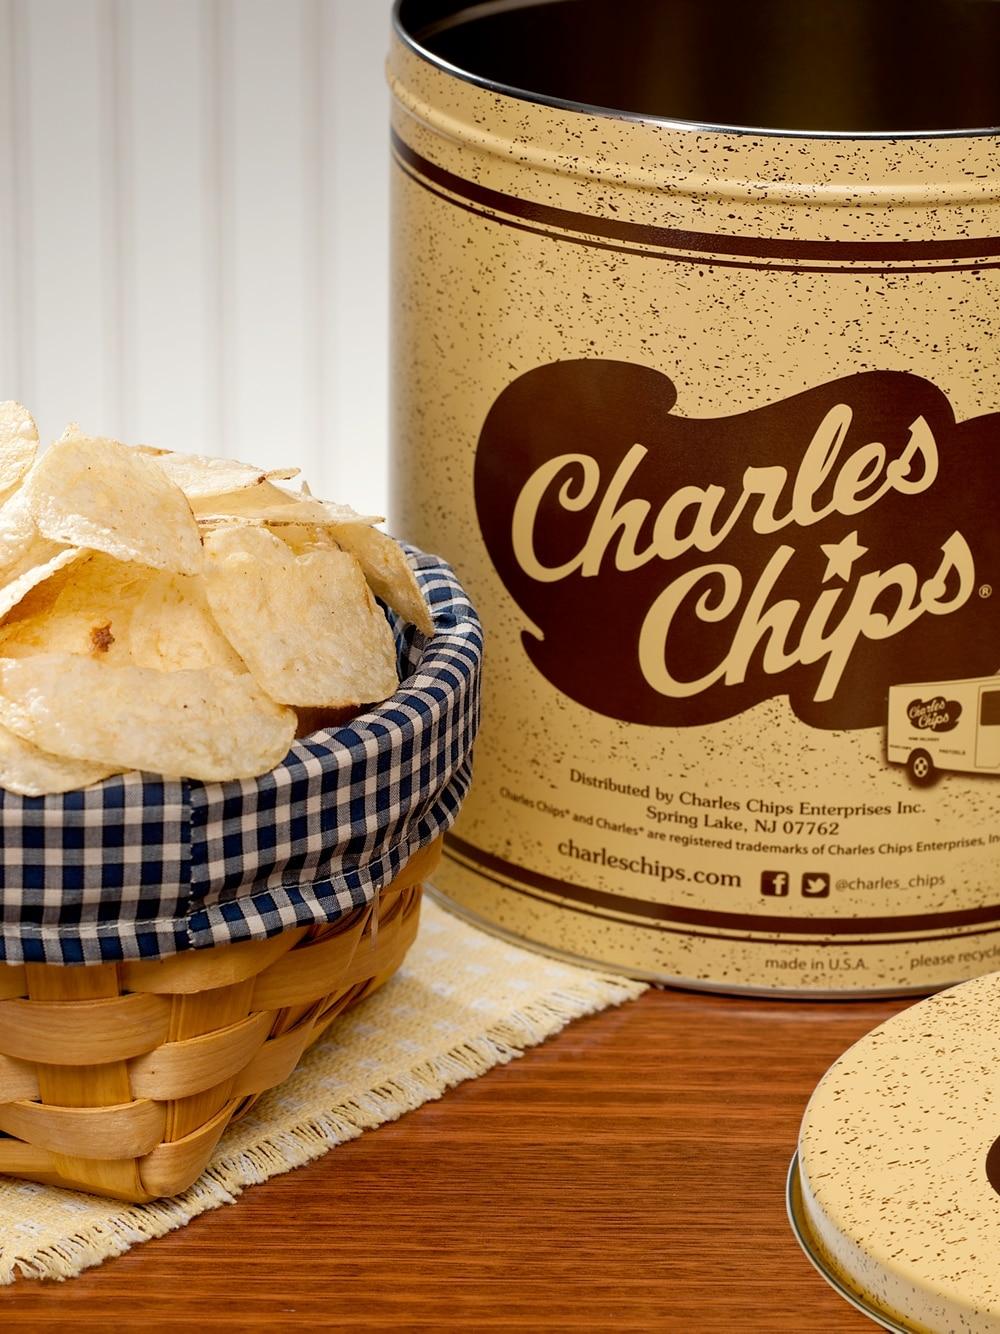 Charles Chips Potato Chip Tin, 1 Pound